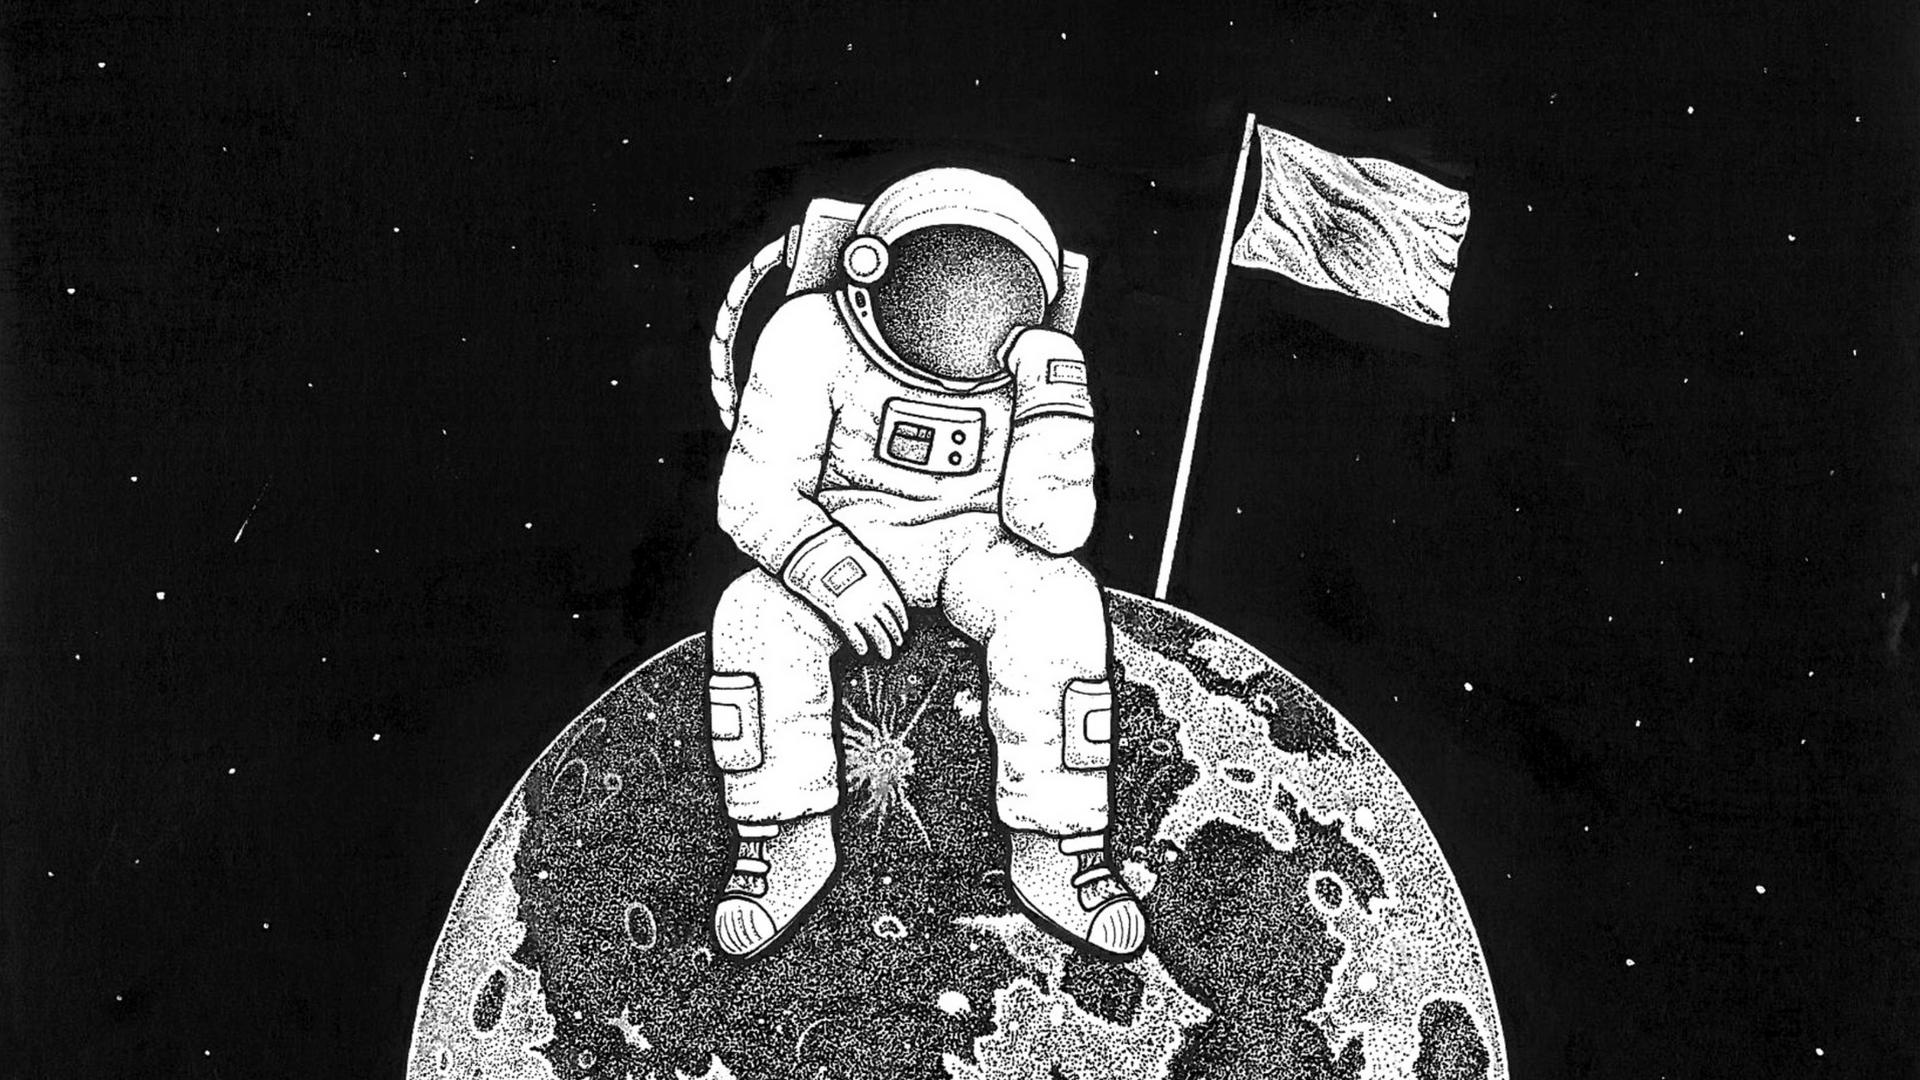 Wallpaper Astronaut Space Drawing Artwork Monochrome Planet Black White 1920x1080 Goethe 1618153 Hd Wallpapers Wallhere